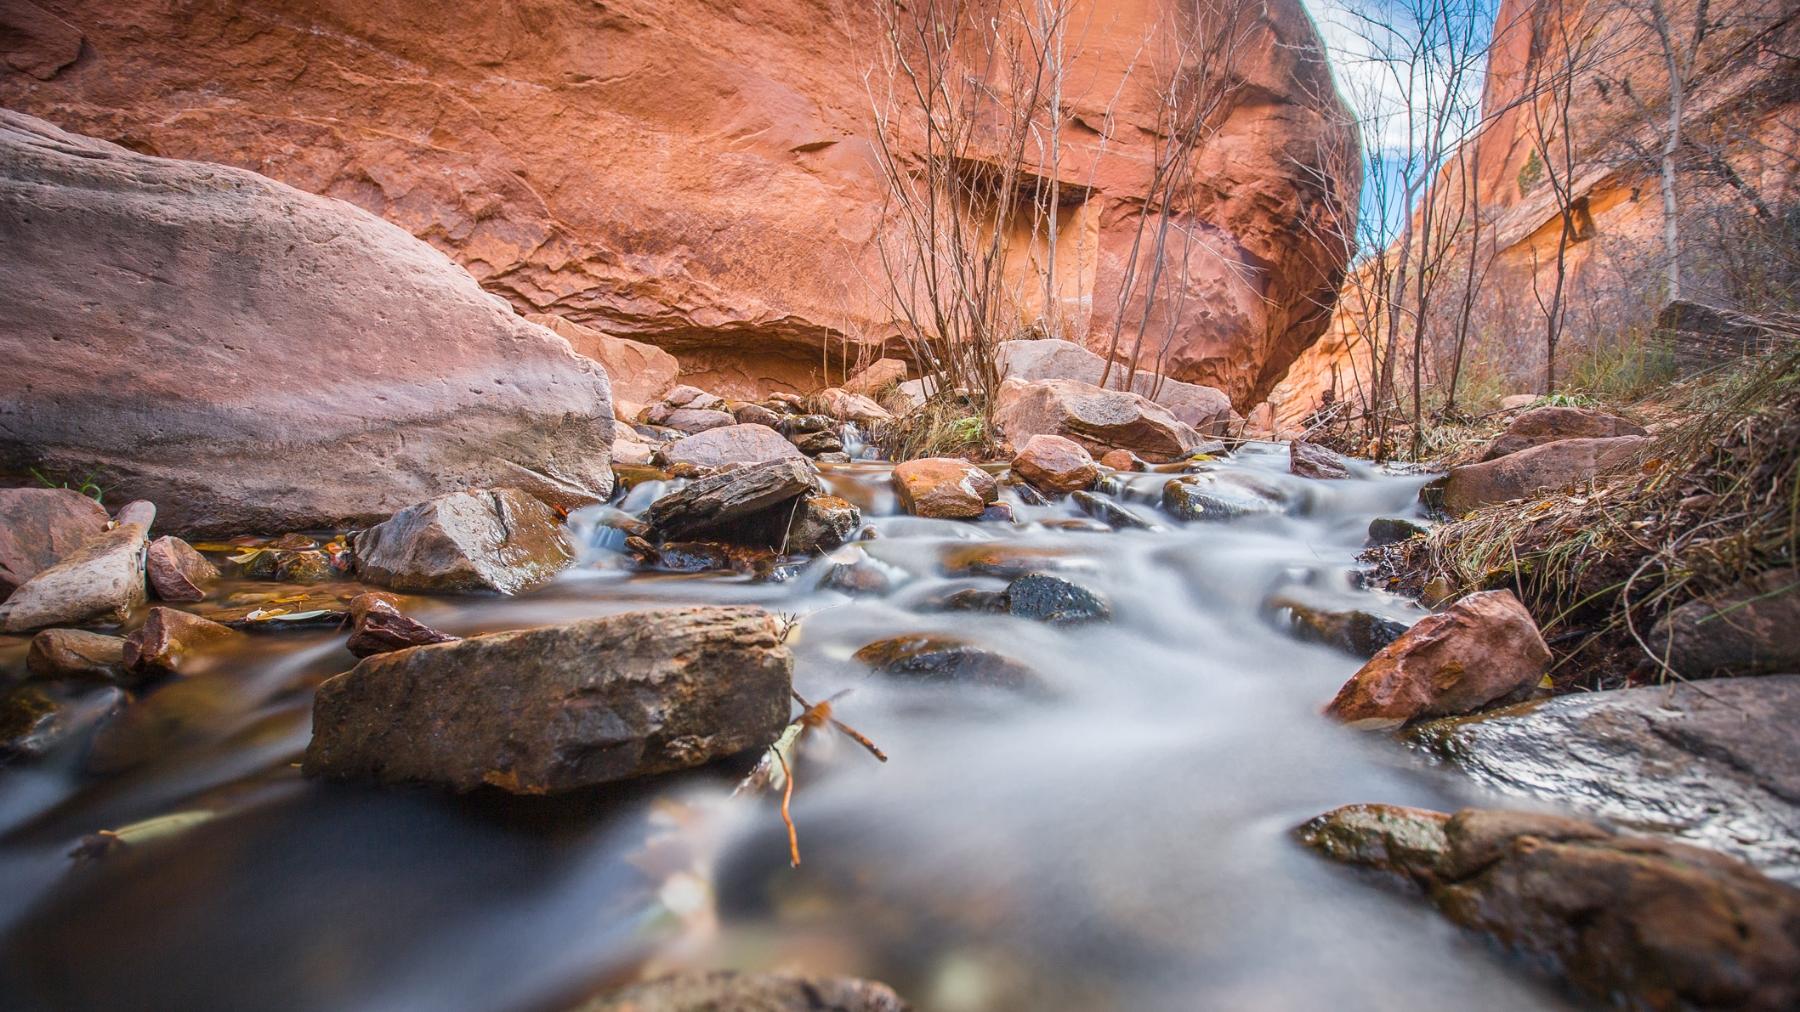 Moab, Bill's Canyon